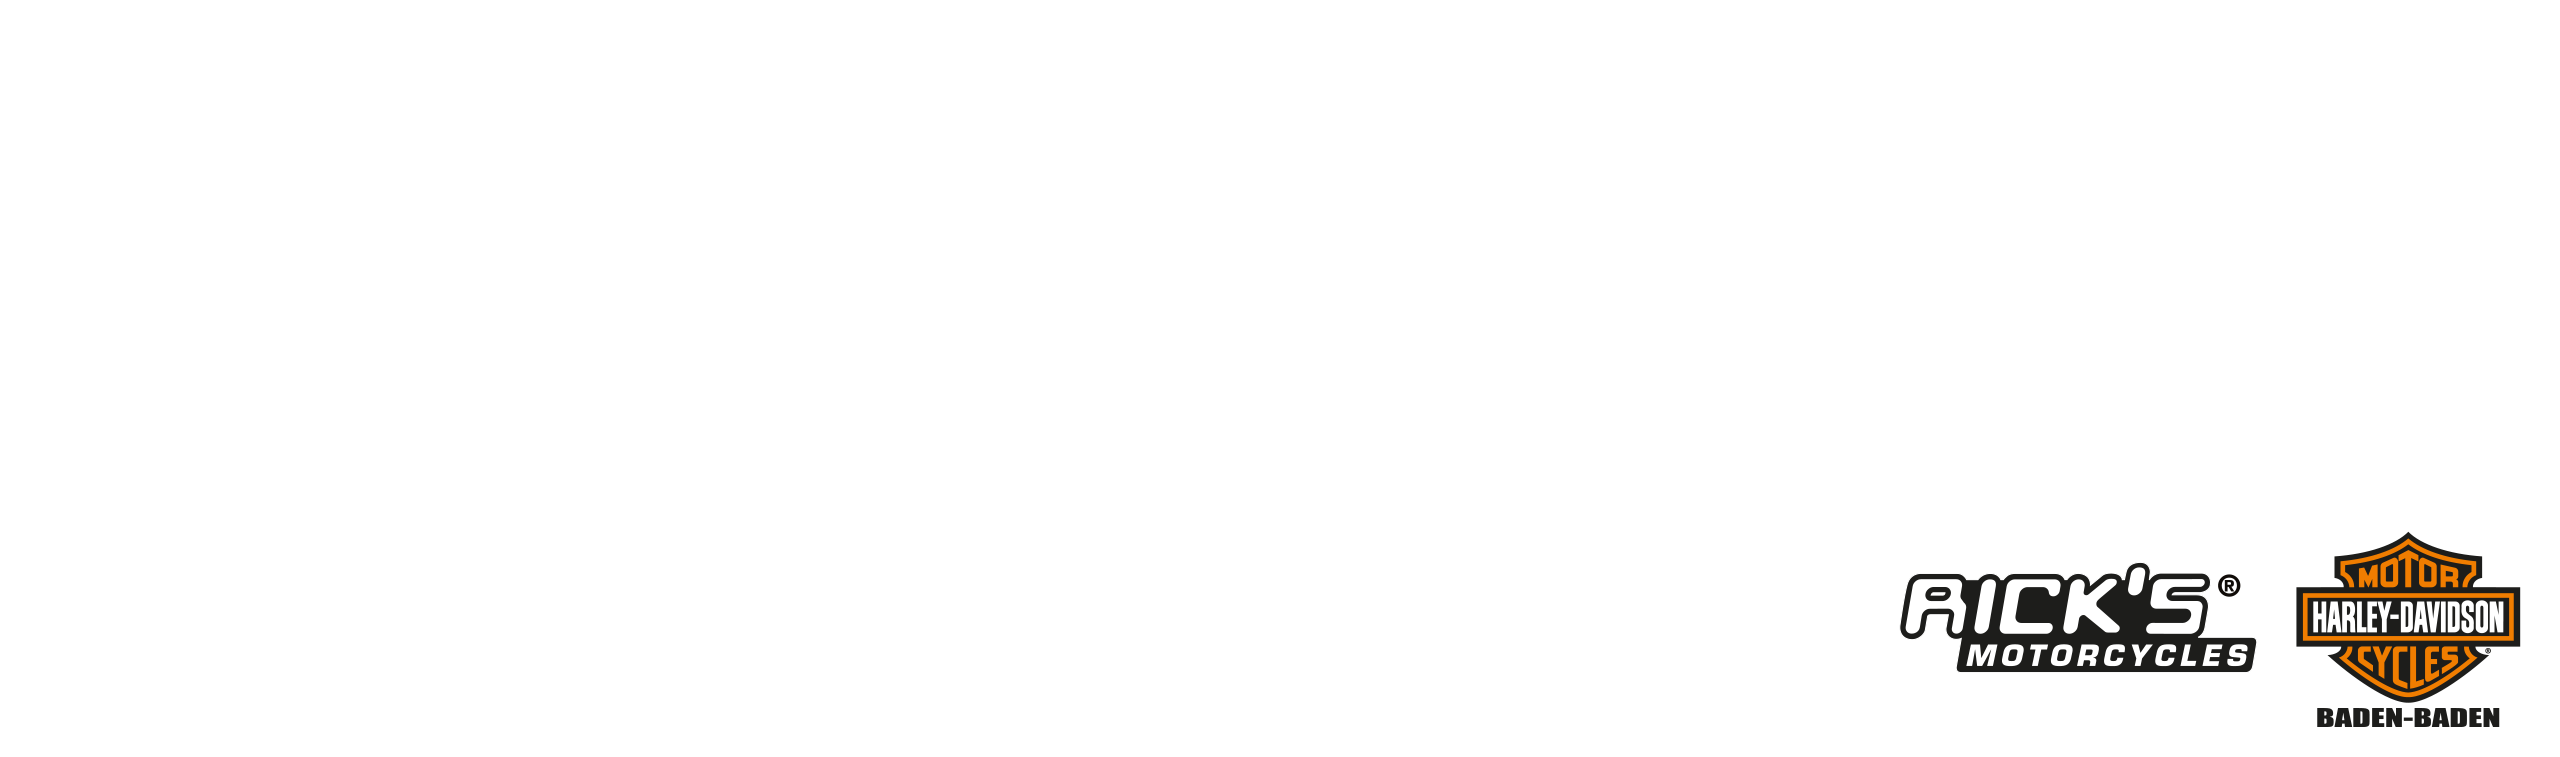 007 Logos Slider